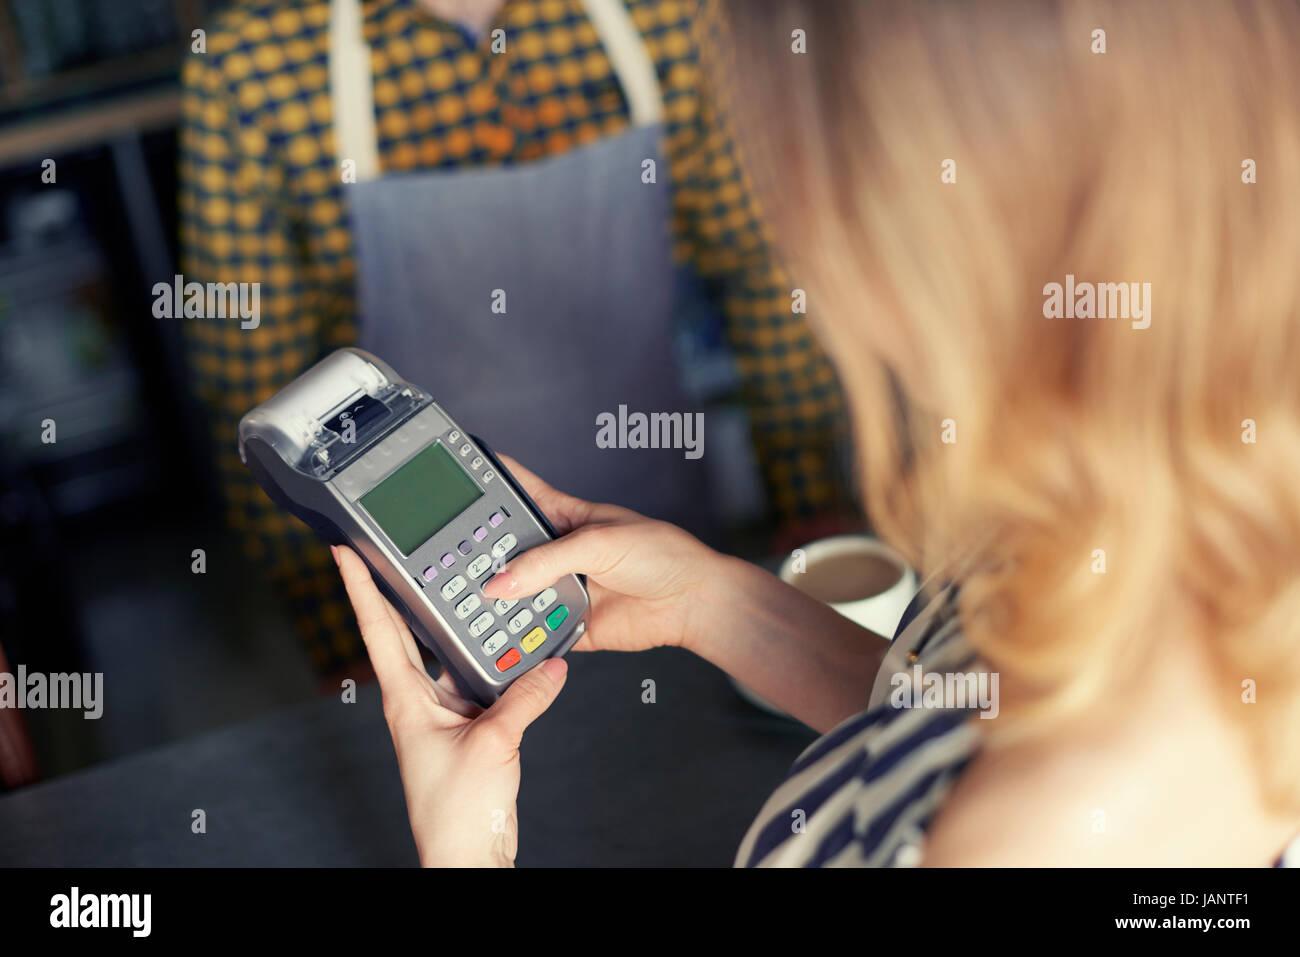 Kunden mit Pin Eingabe Kreditkartenleser Stockfoto